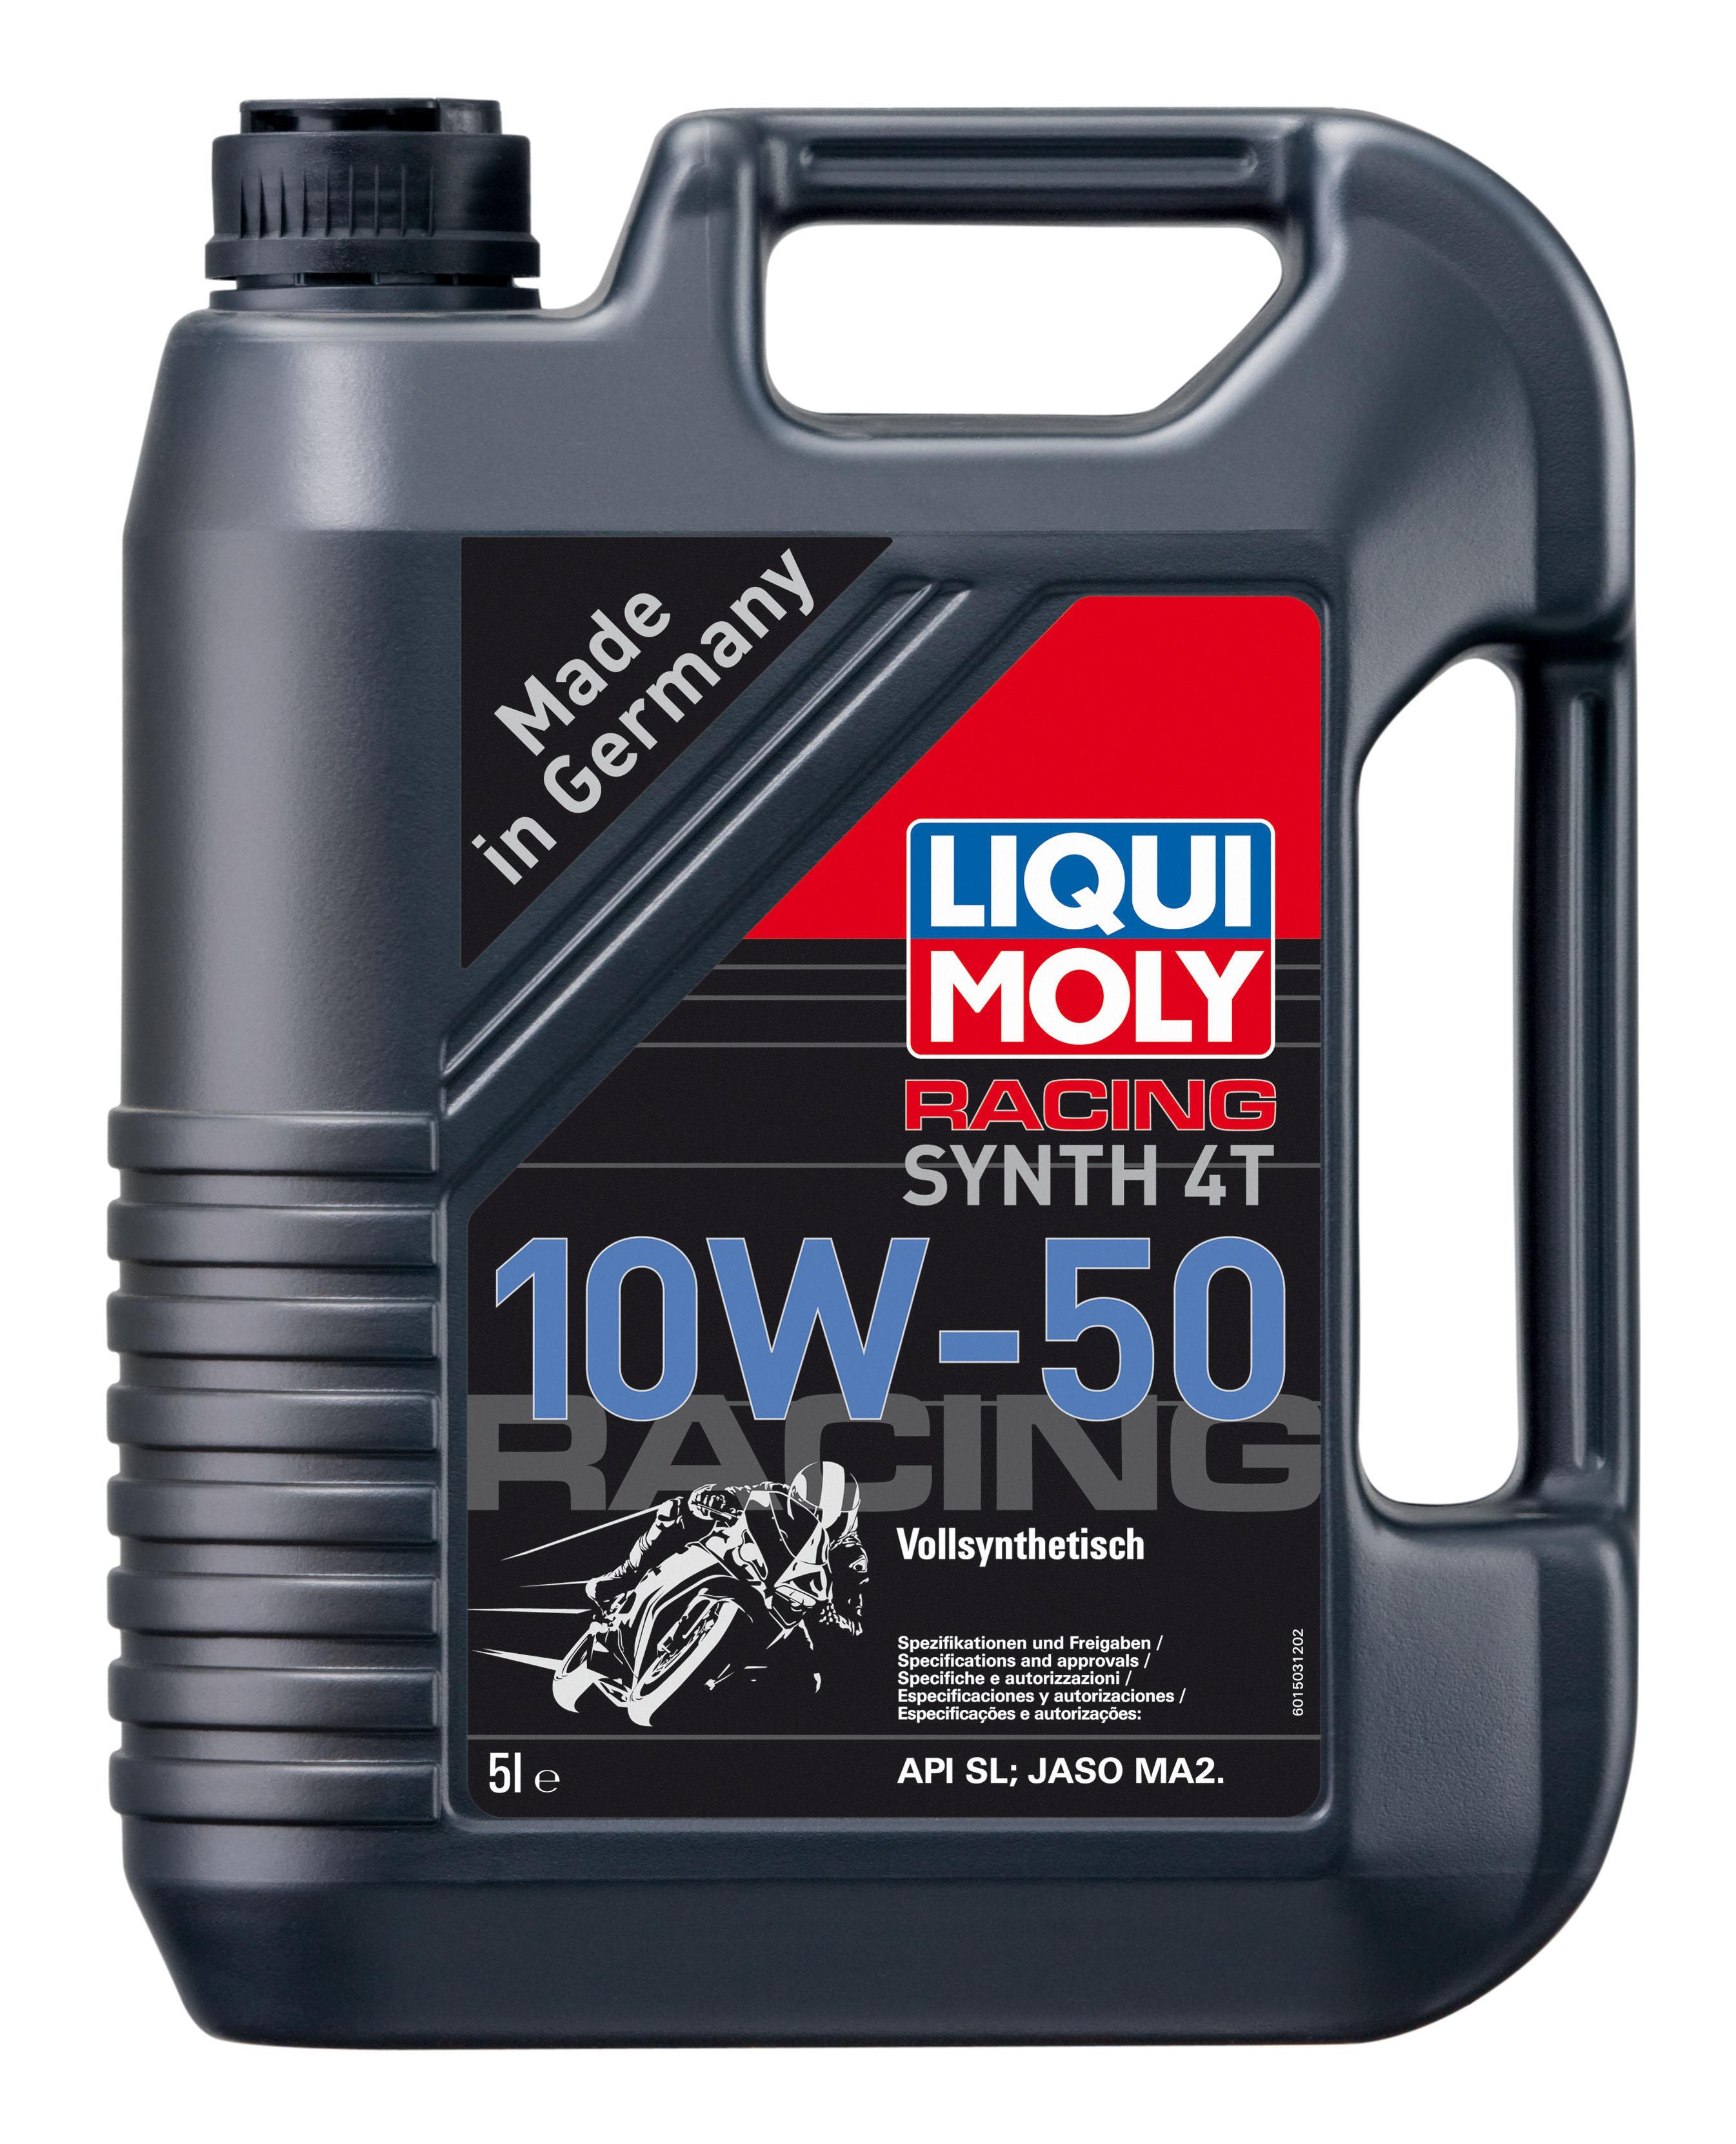 LM שמן לאופנוע 10W50 סנטטי 5  4T ליטר ליקווי מולי